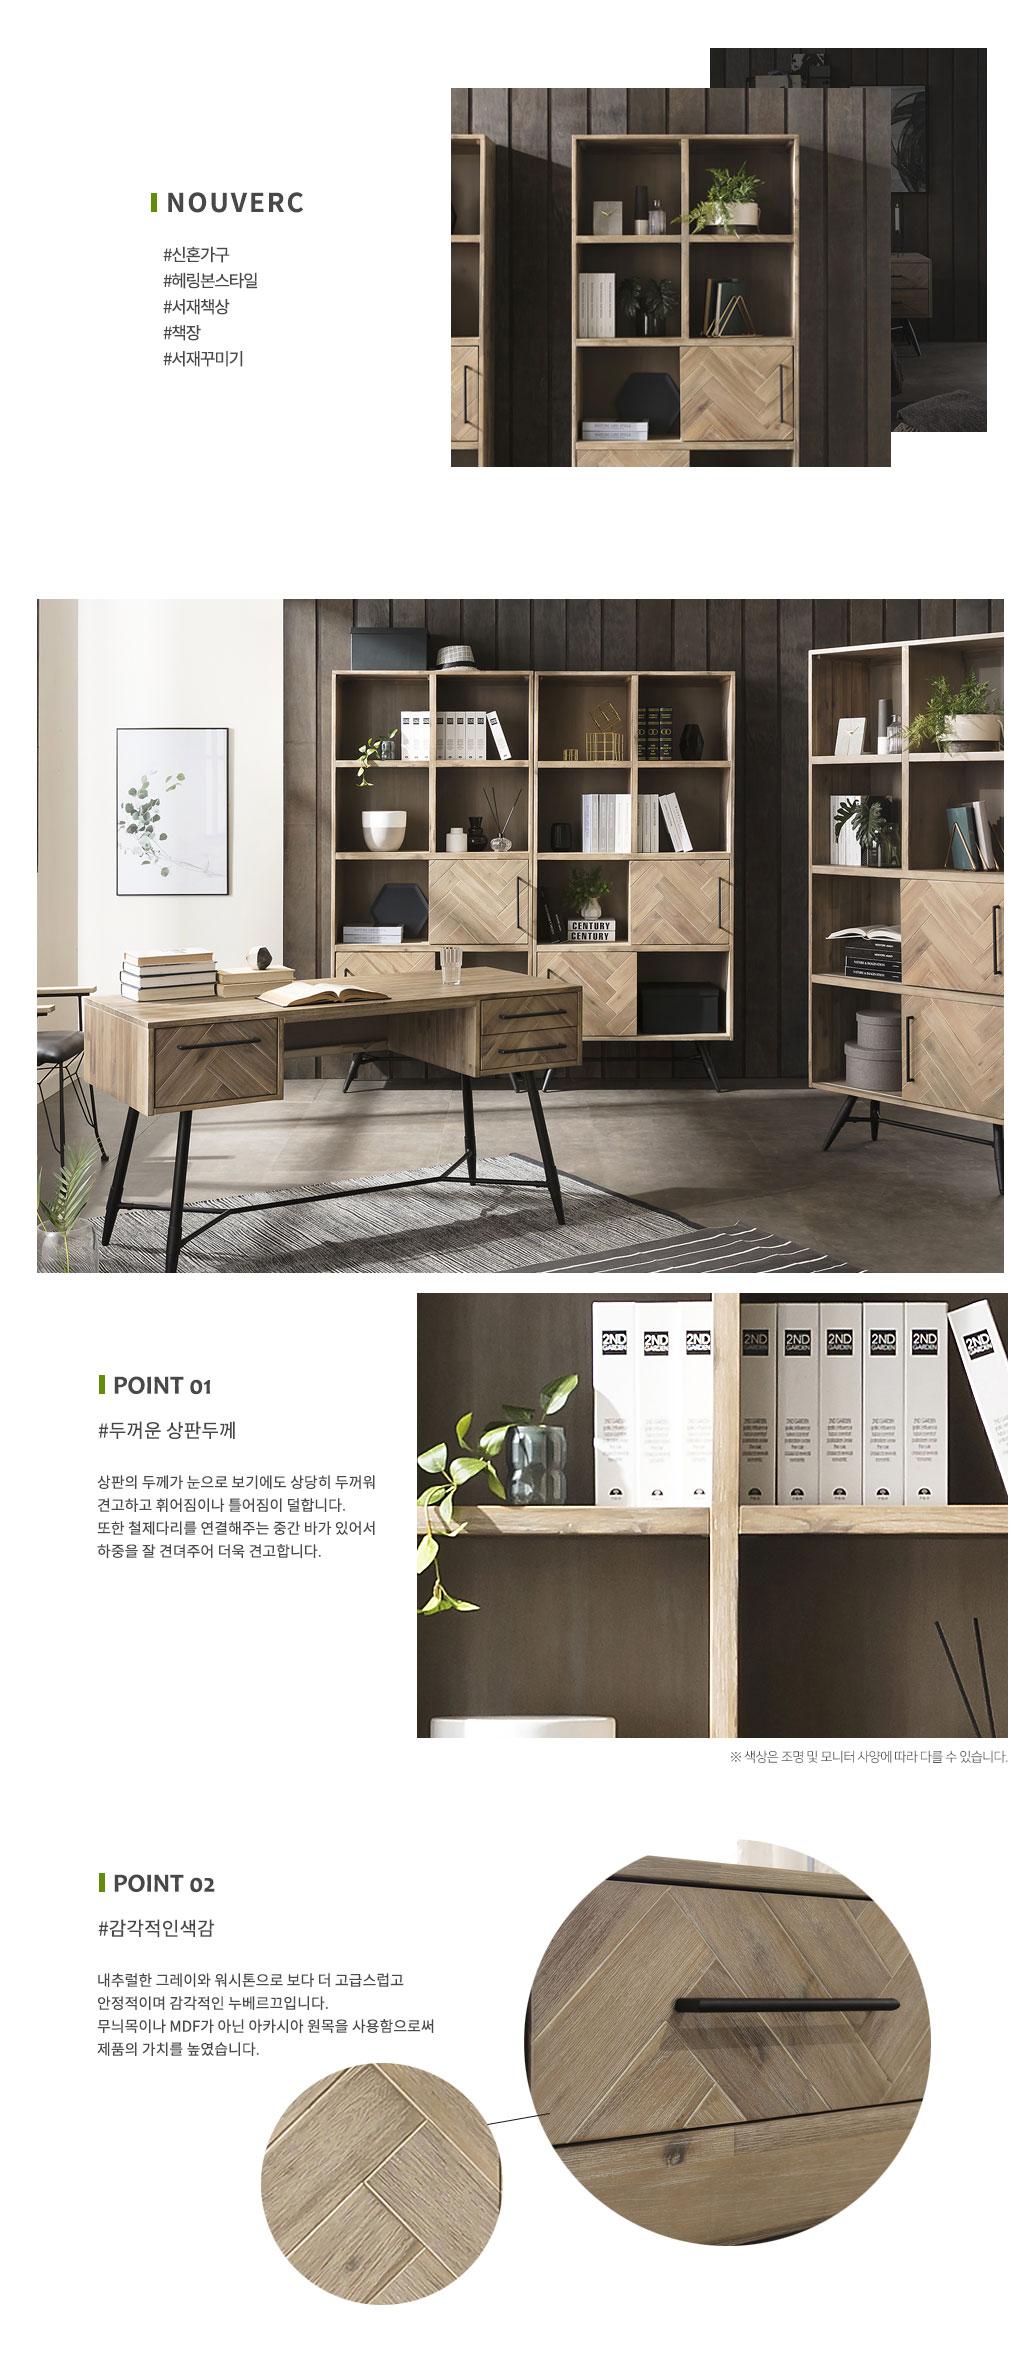 nouverc_bookcase_04.jpg